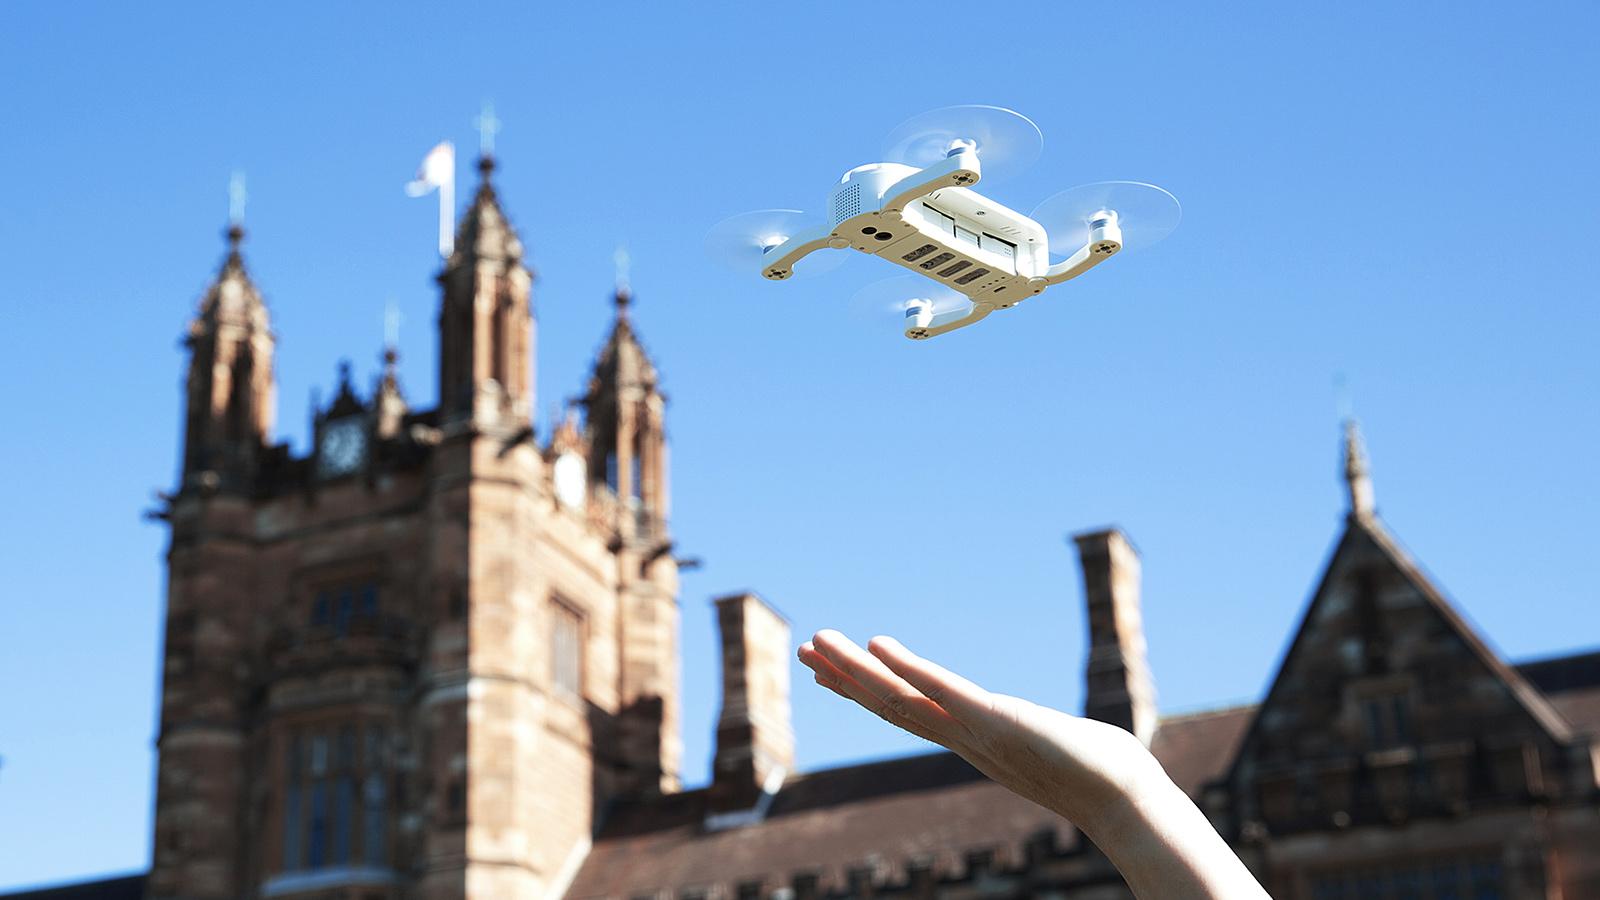 Zerotech Dobby Drone чуть больше ладони